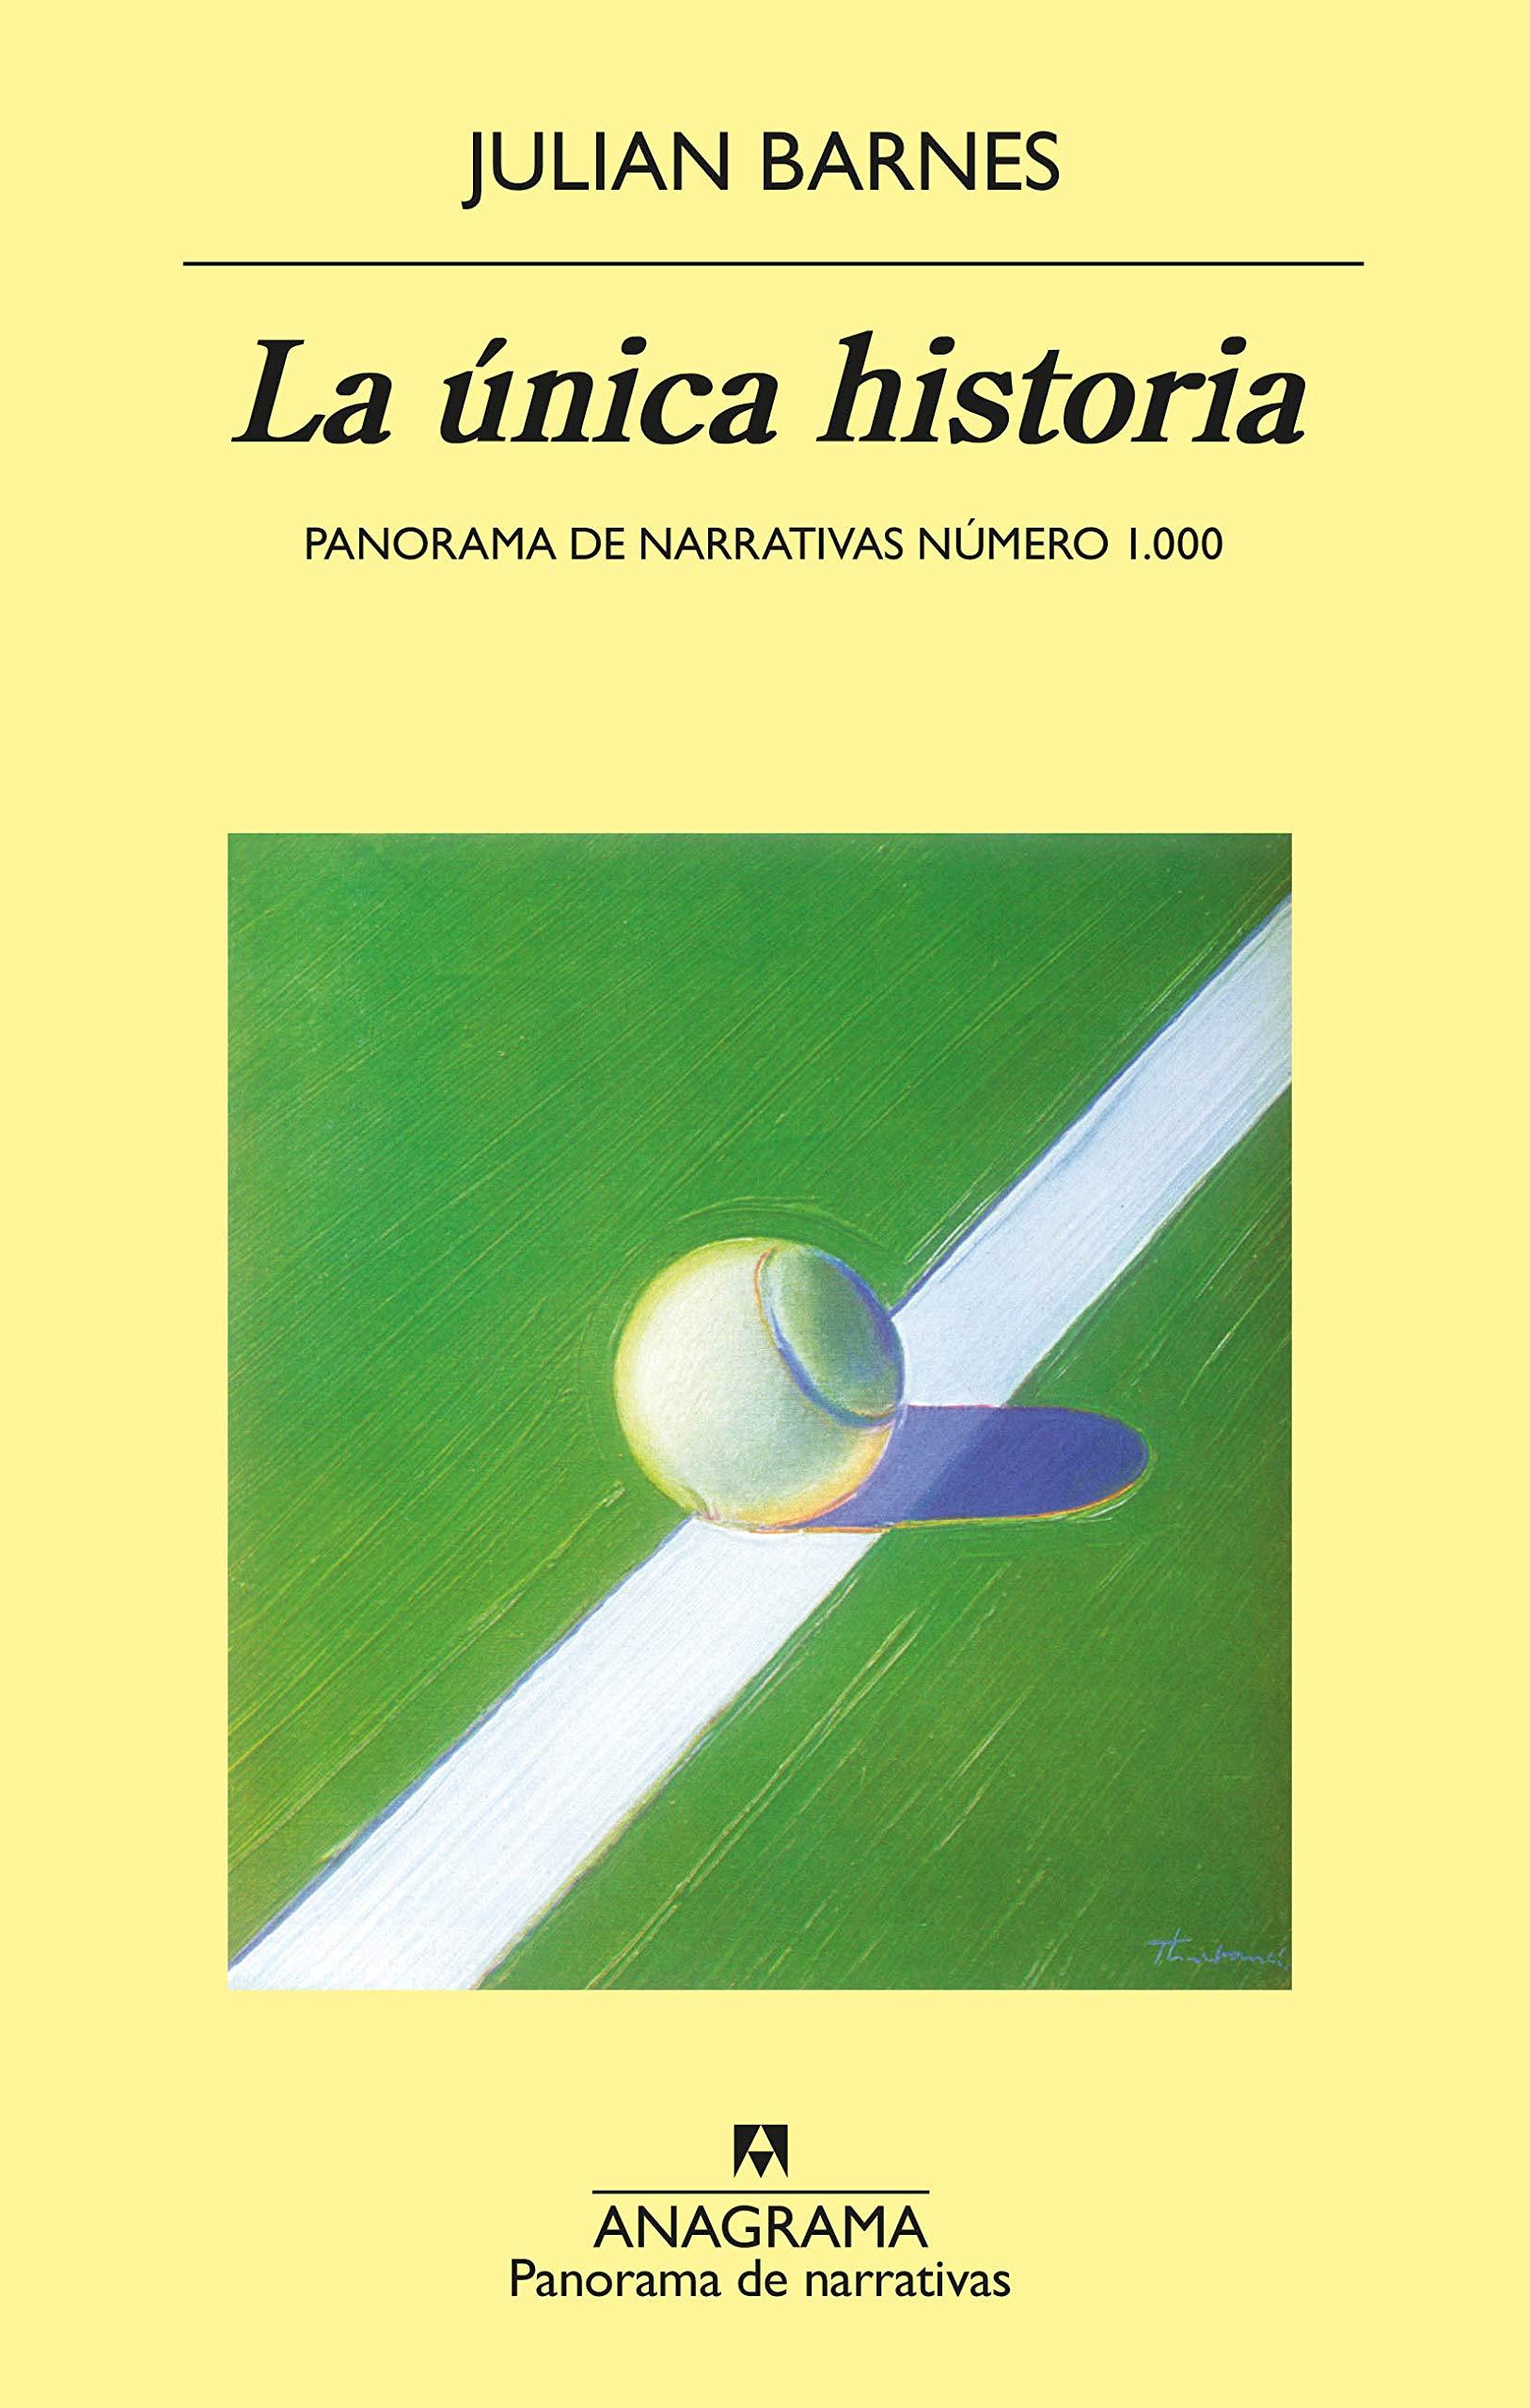 La única historia (PANORAMA DE NARRATIVAS nº 1000) por Julian Barnes